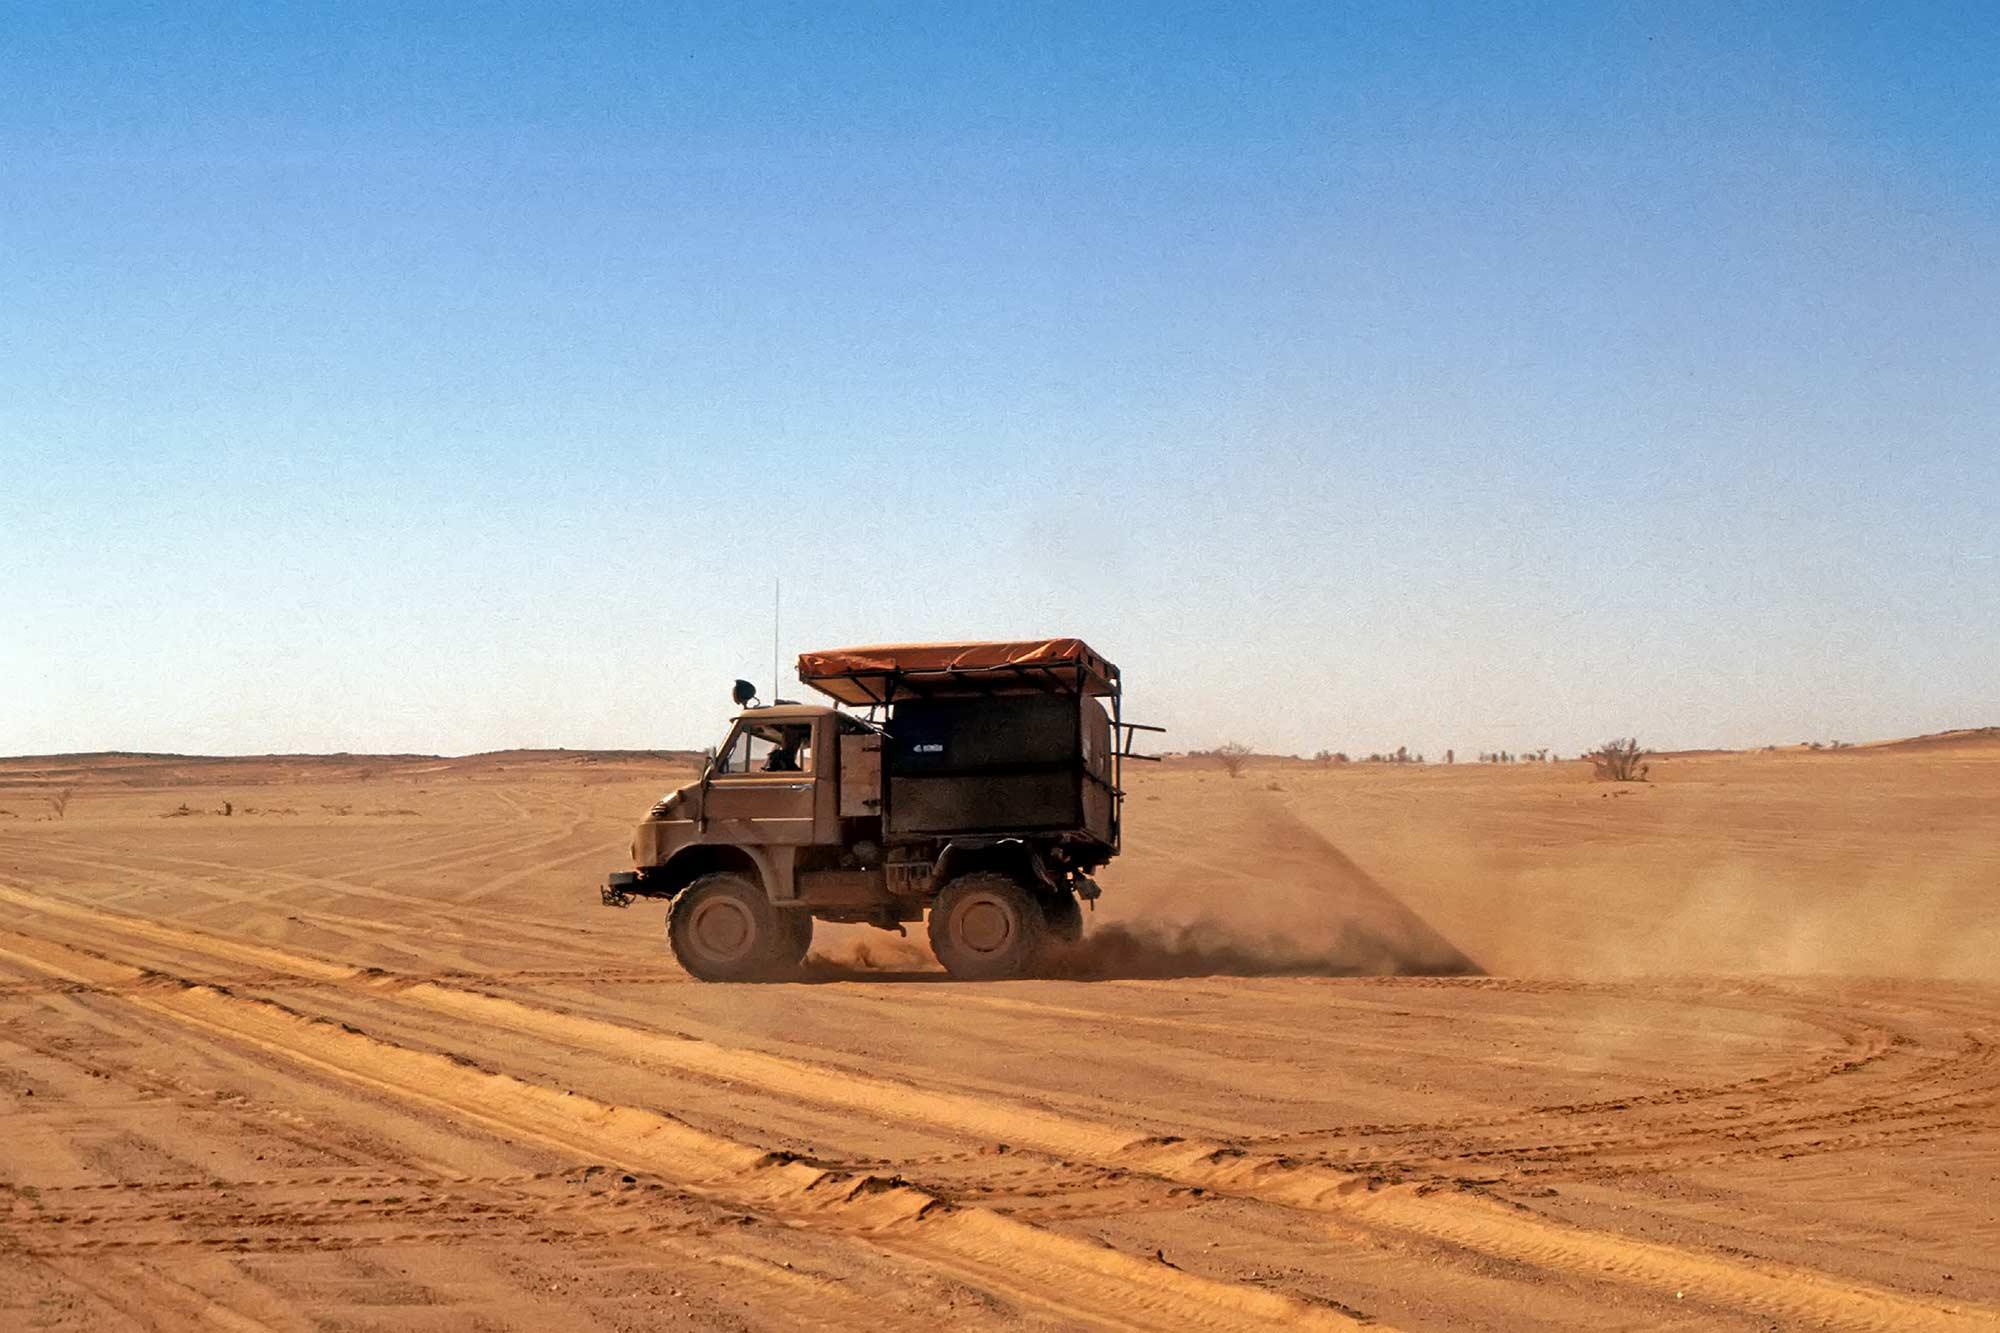 unimog-northern-sudan-africa-desert